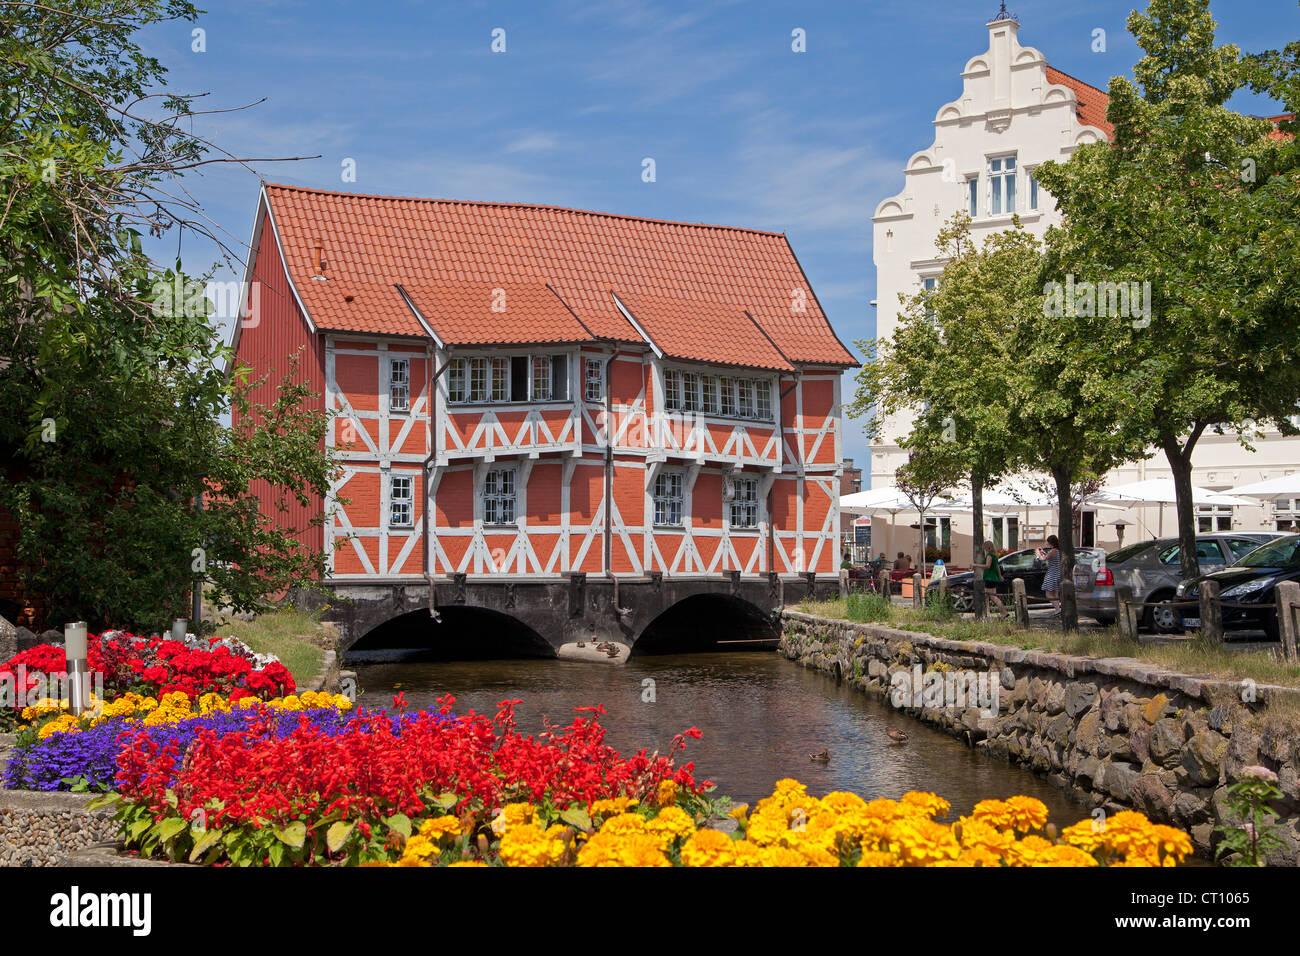 frame house called Gewoelbe built across River Grube, Wismar, Mecklenburg-West Pomerania, Germany - Stock Image